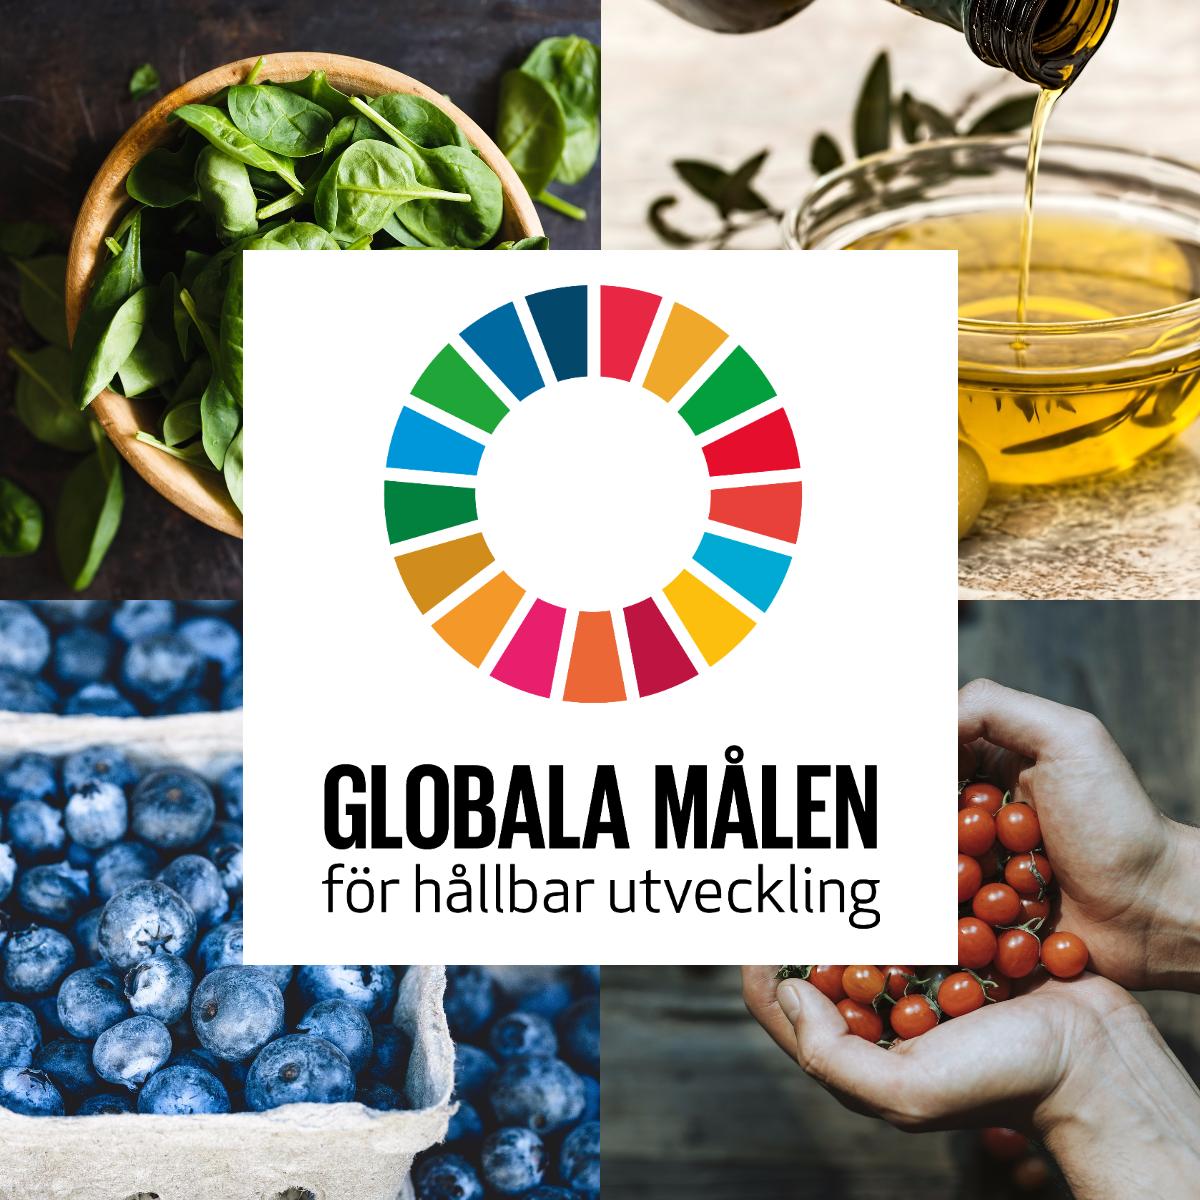 Meal Makers - Globala målen